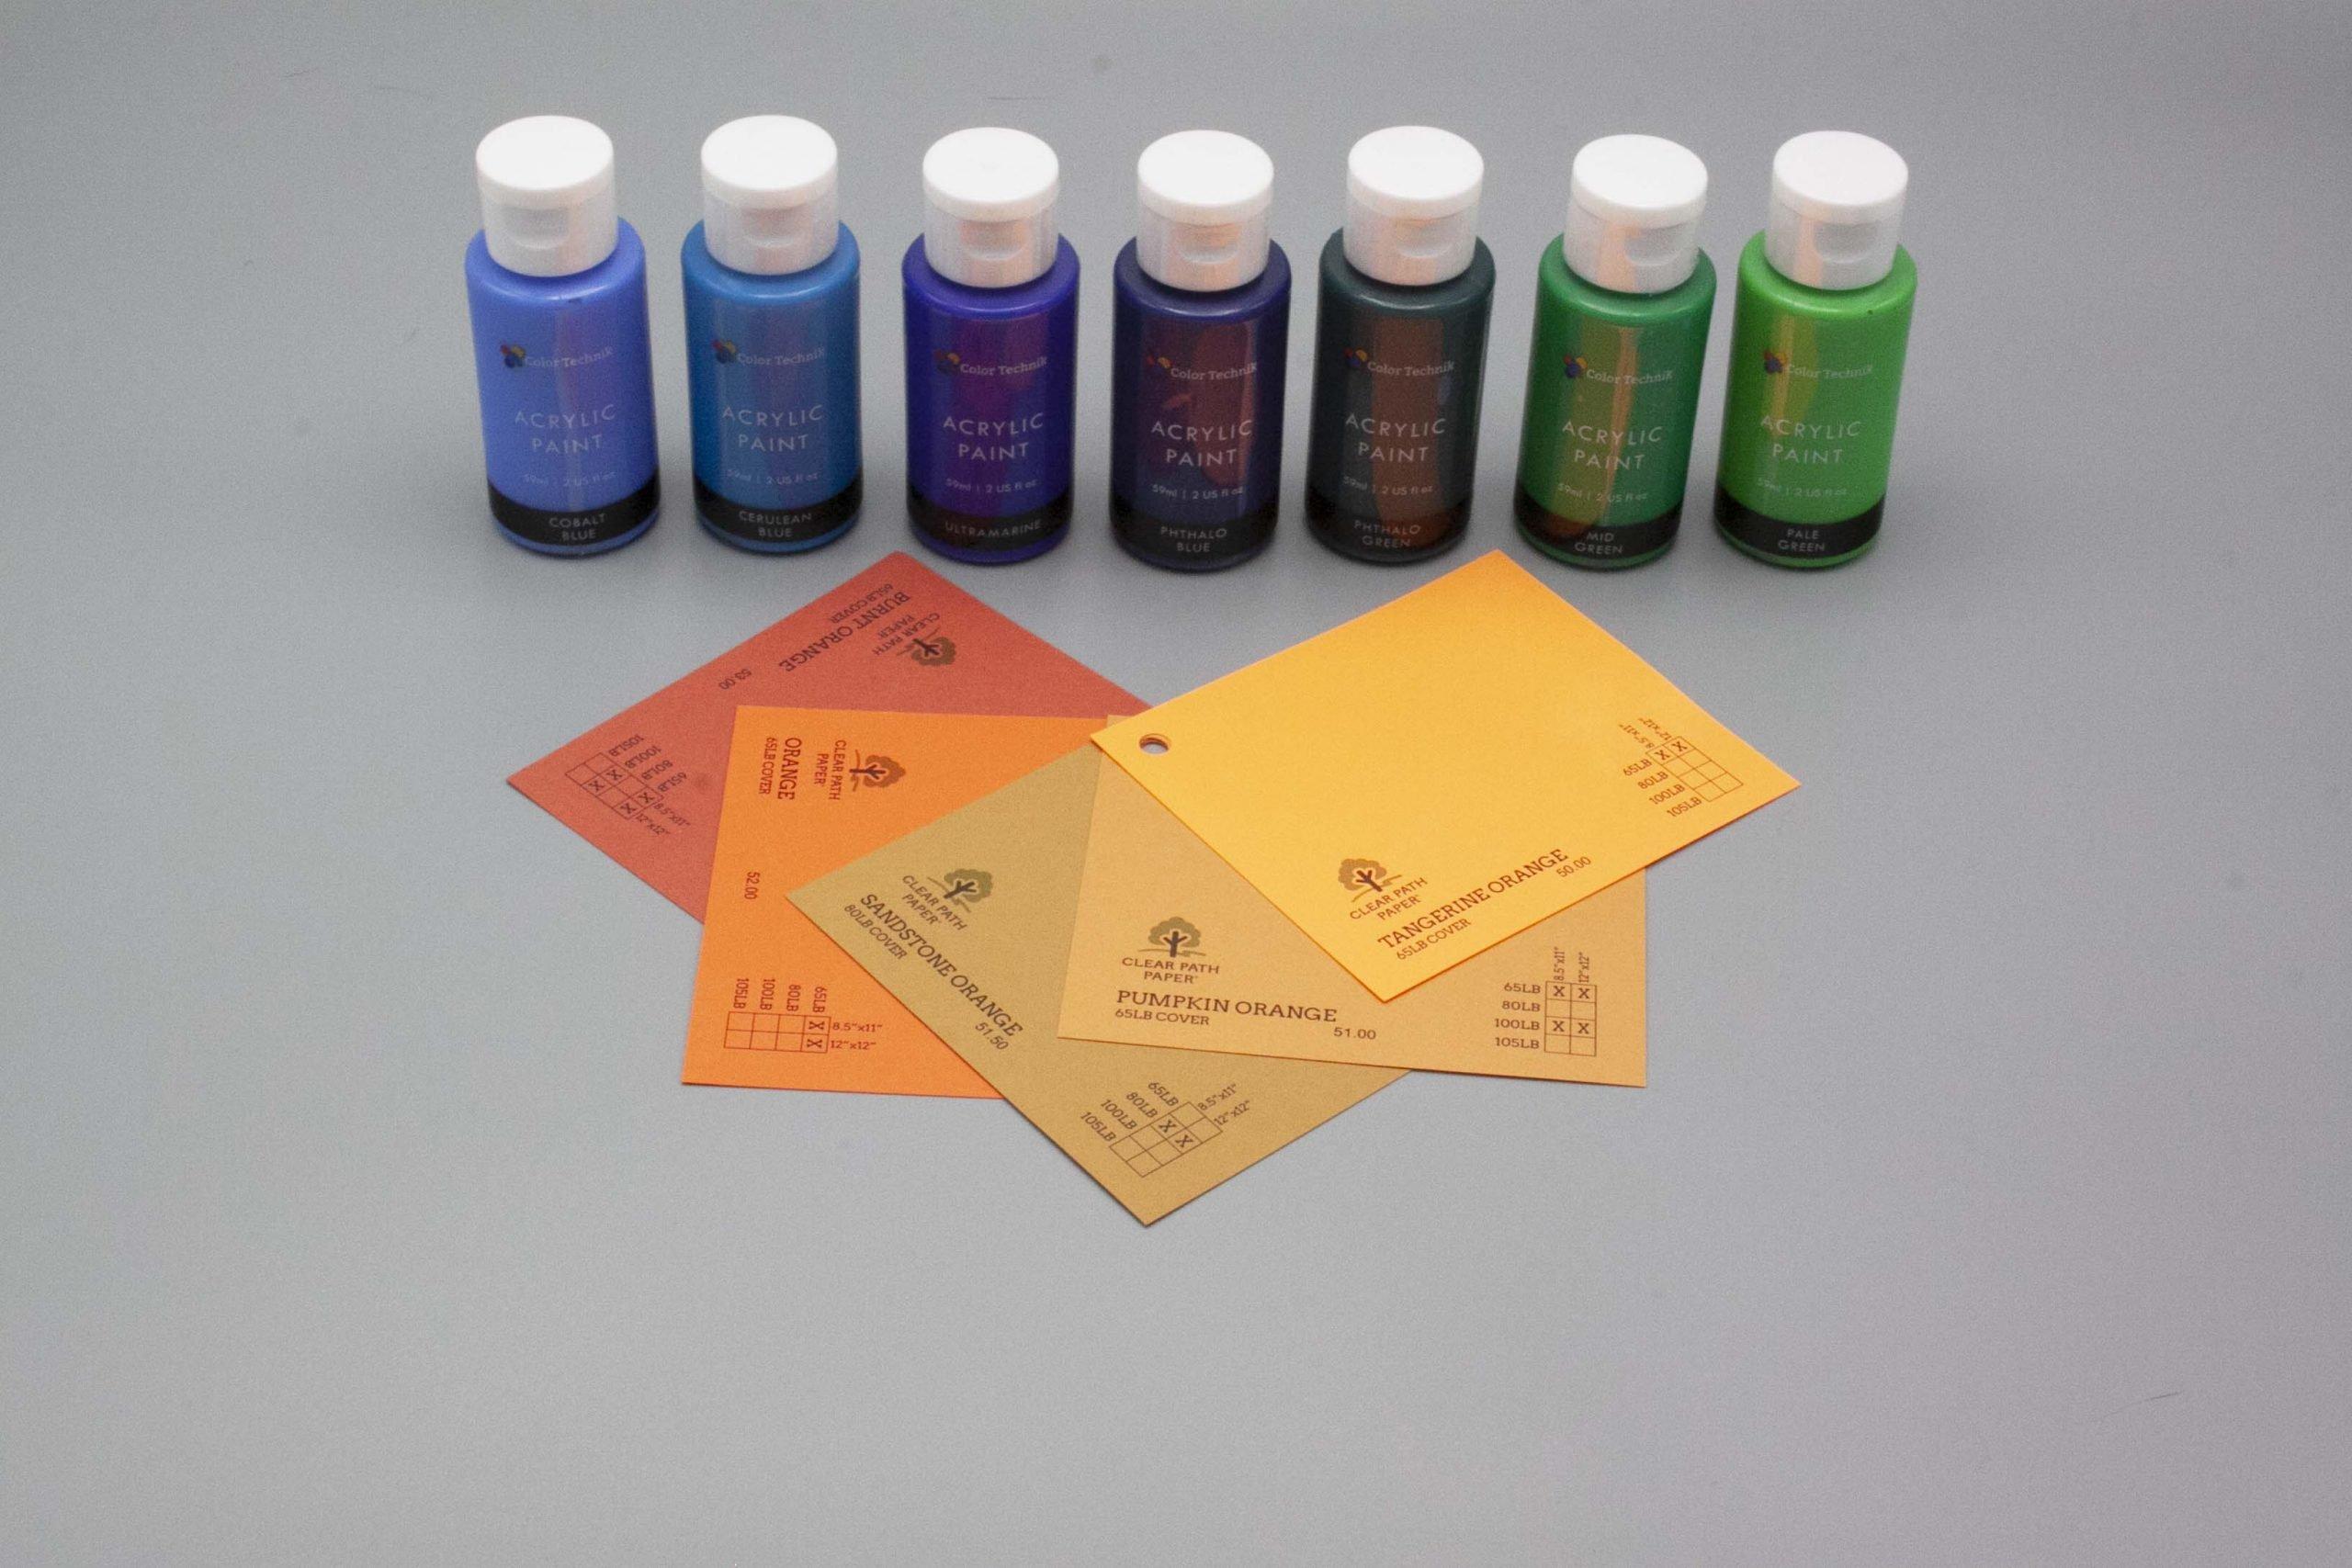 Image of Acrylic Paint on Orange Cardstock